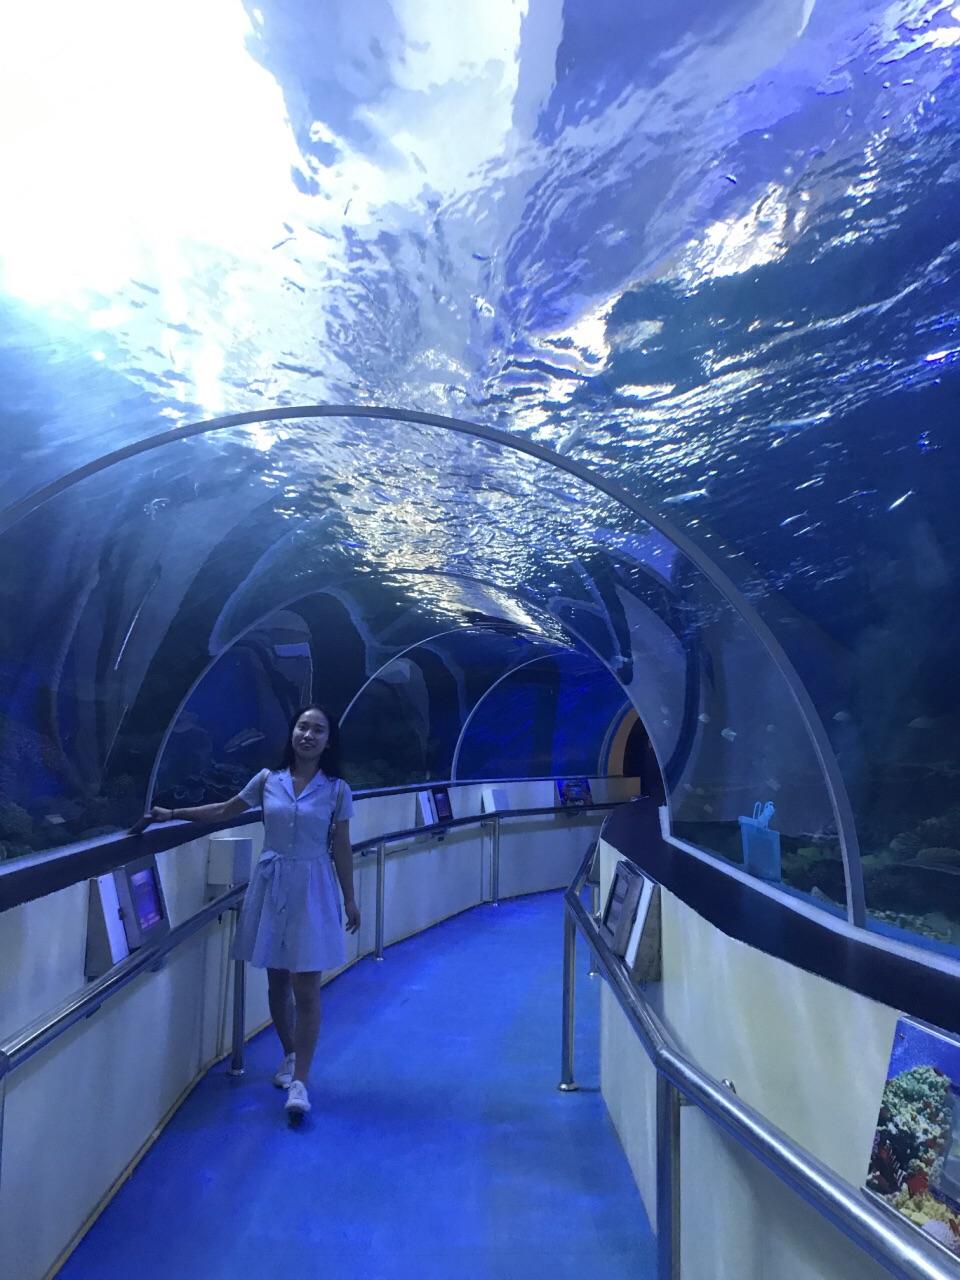 Waghor水族館